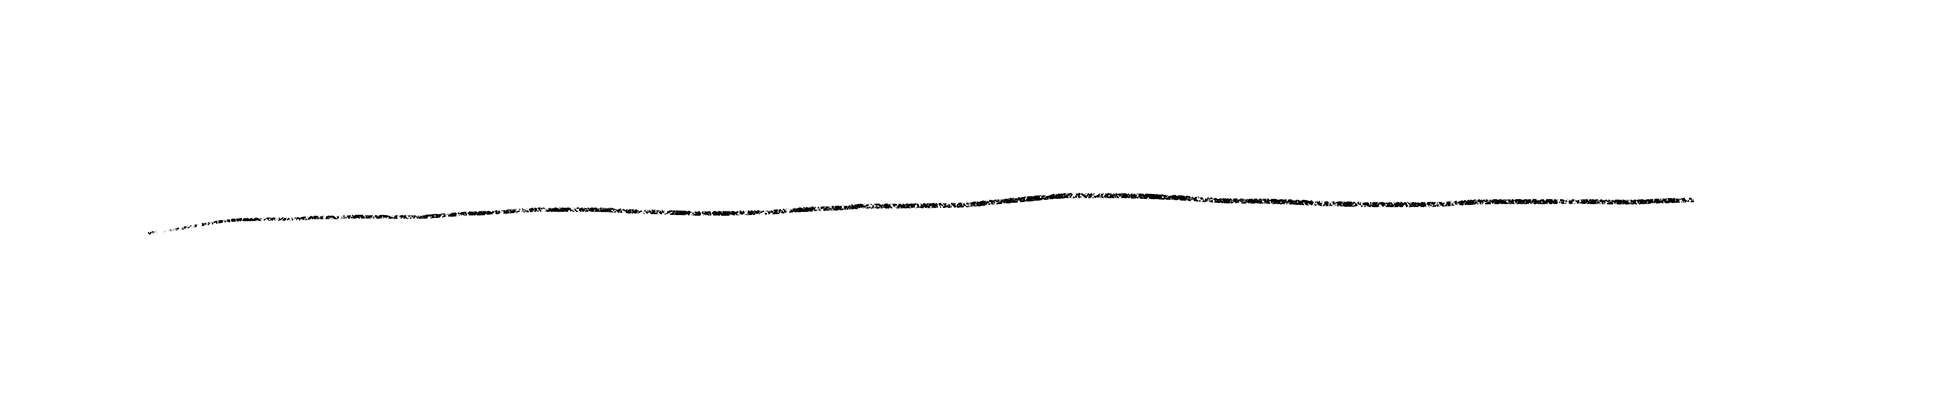 horizon-line.png